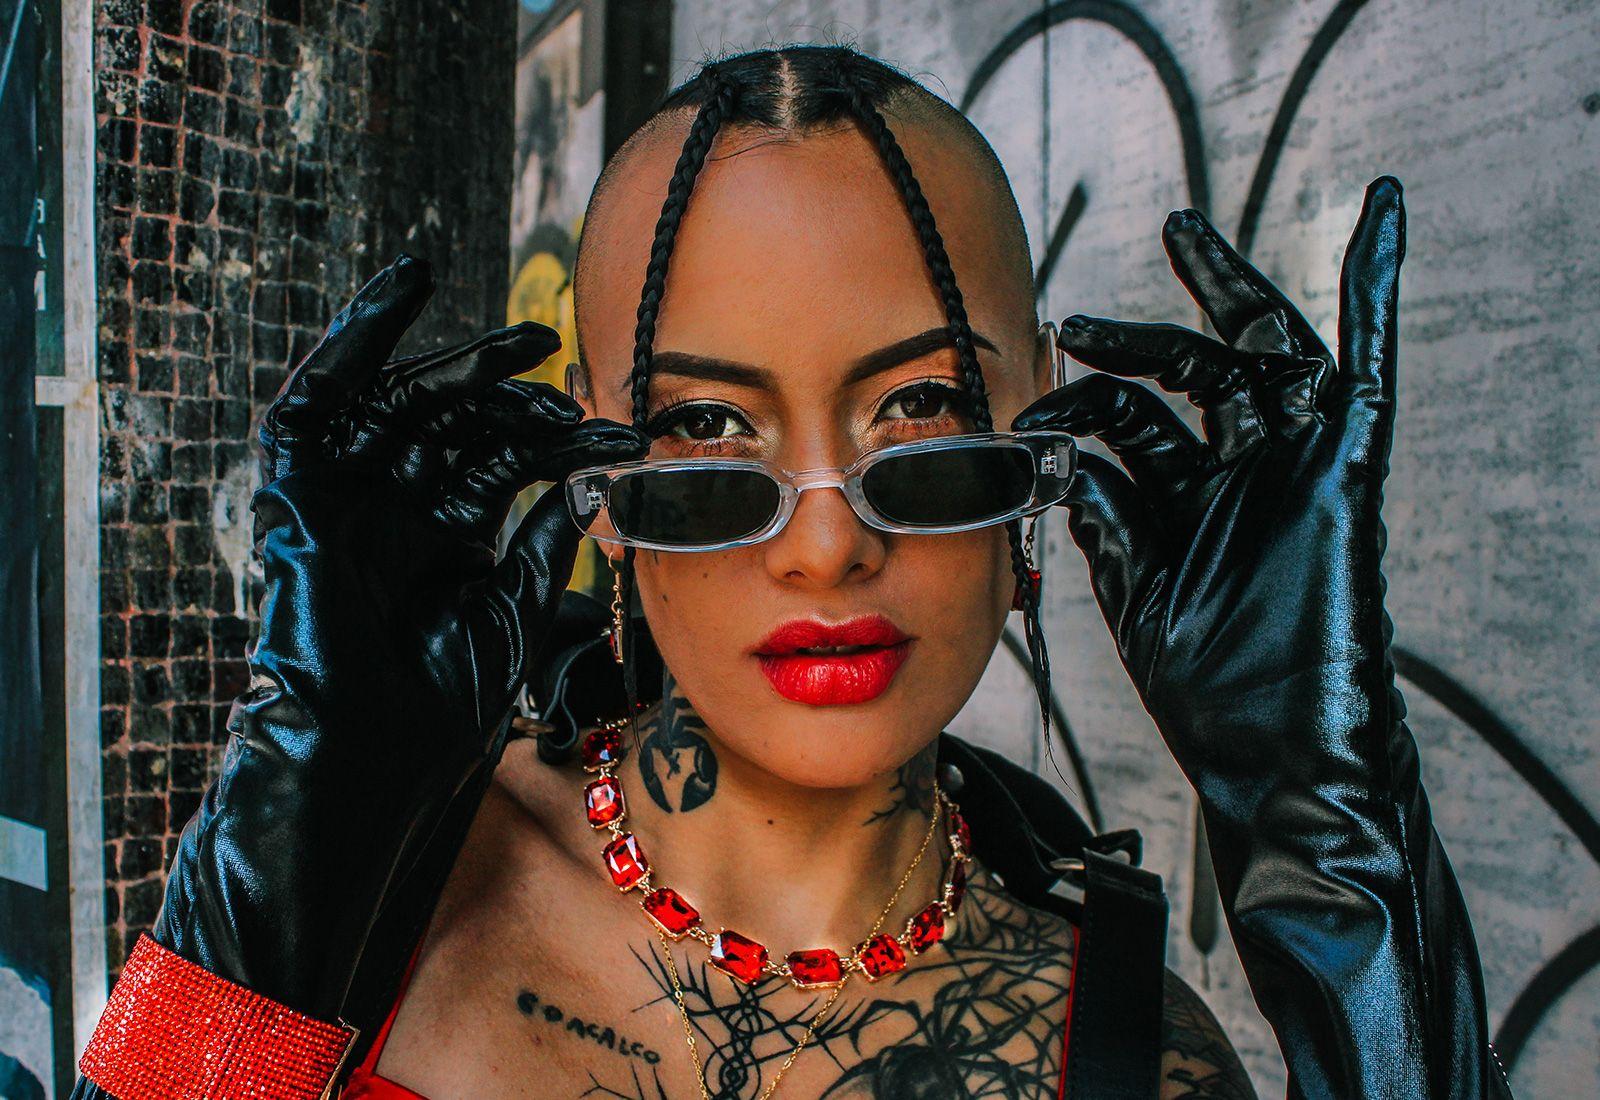 dj rosa pistola curator mexico city soundsystem